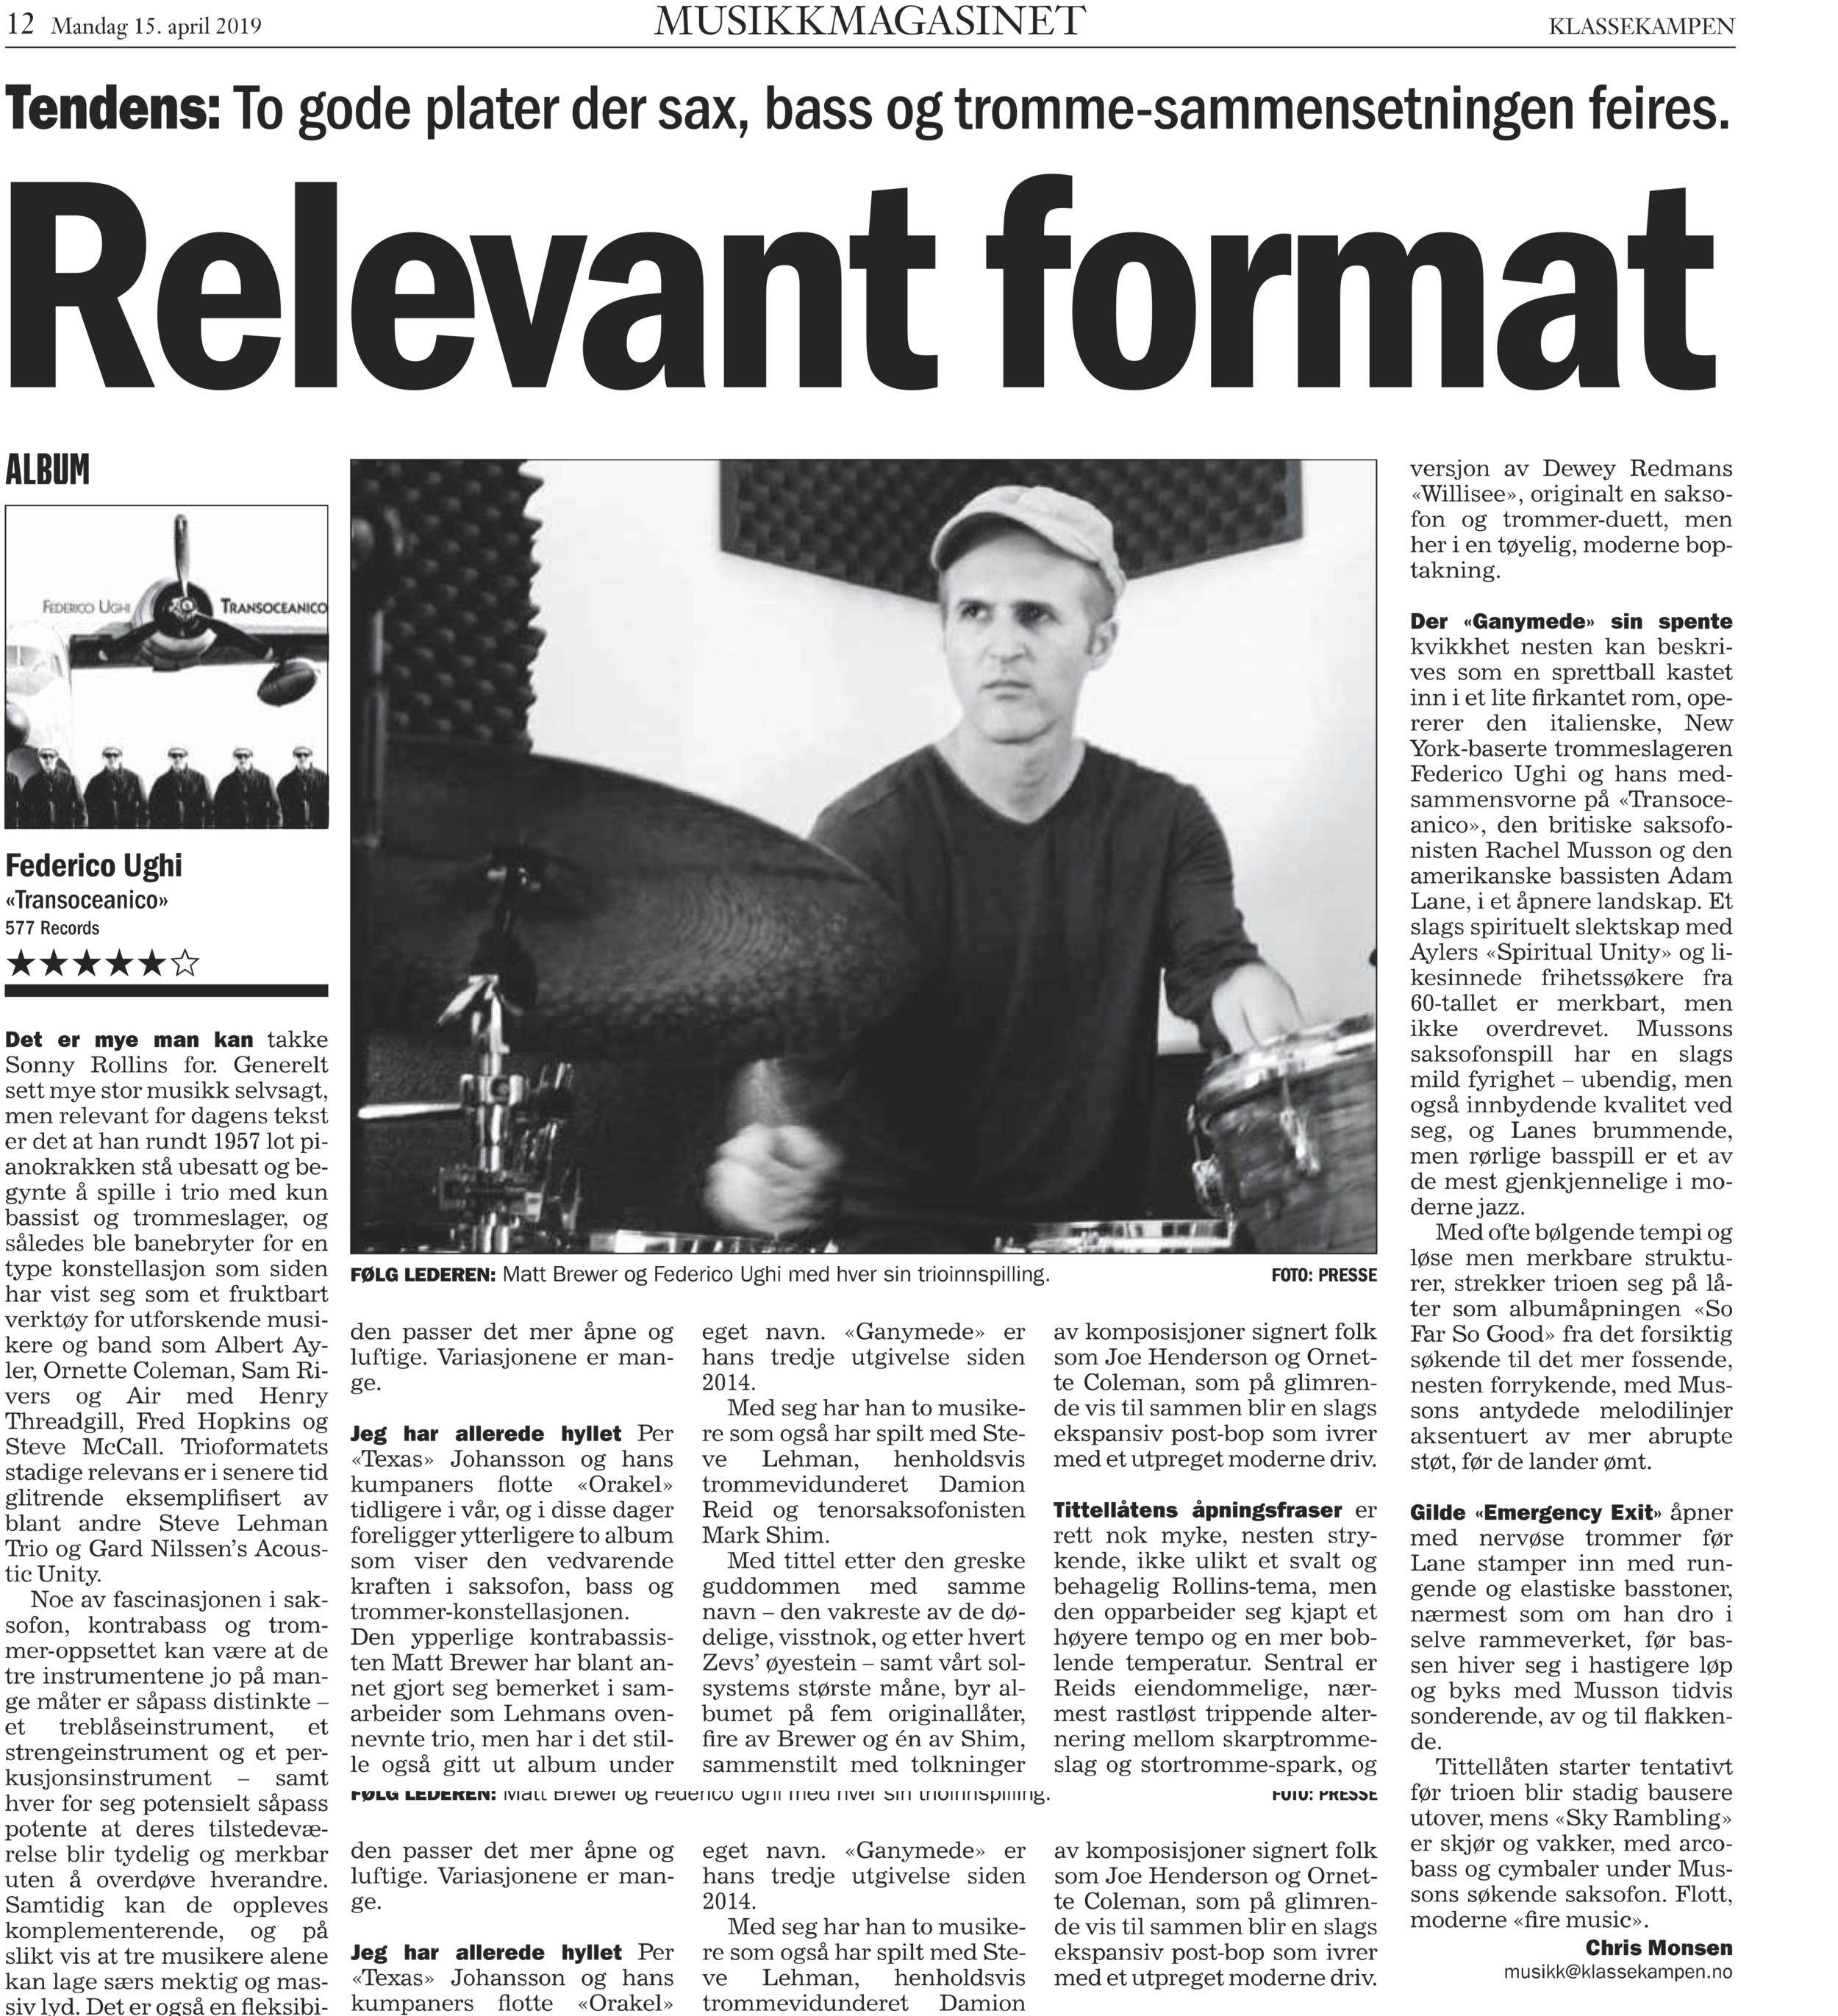 p. 40 Musikkmagasinet 04.15.2019.png